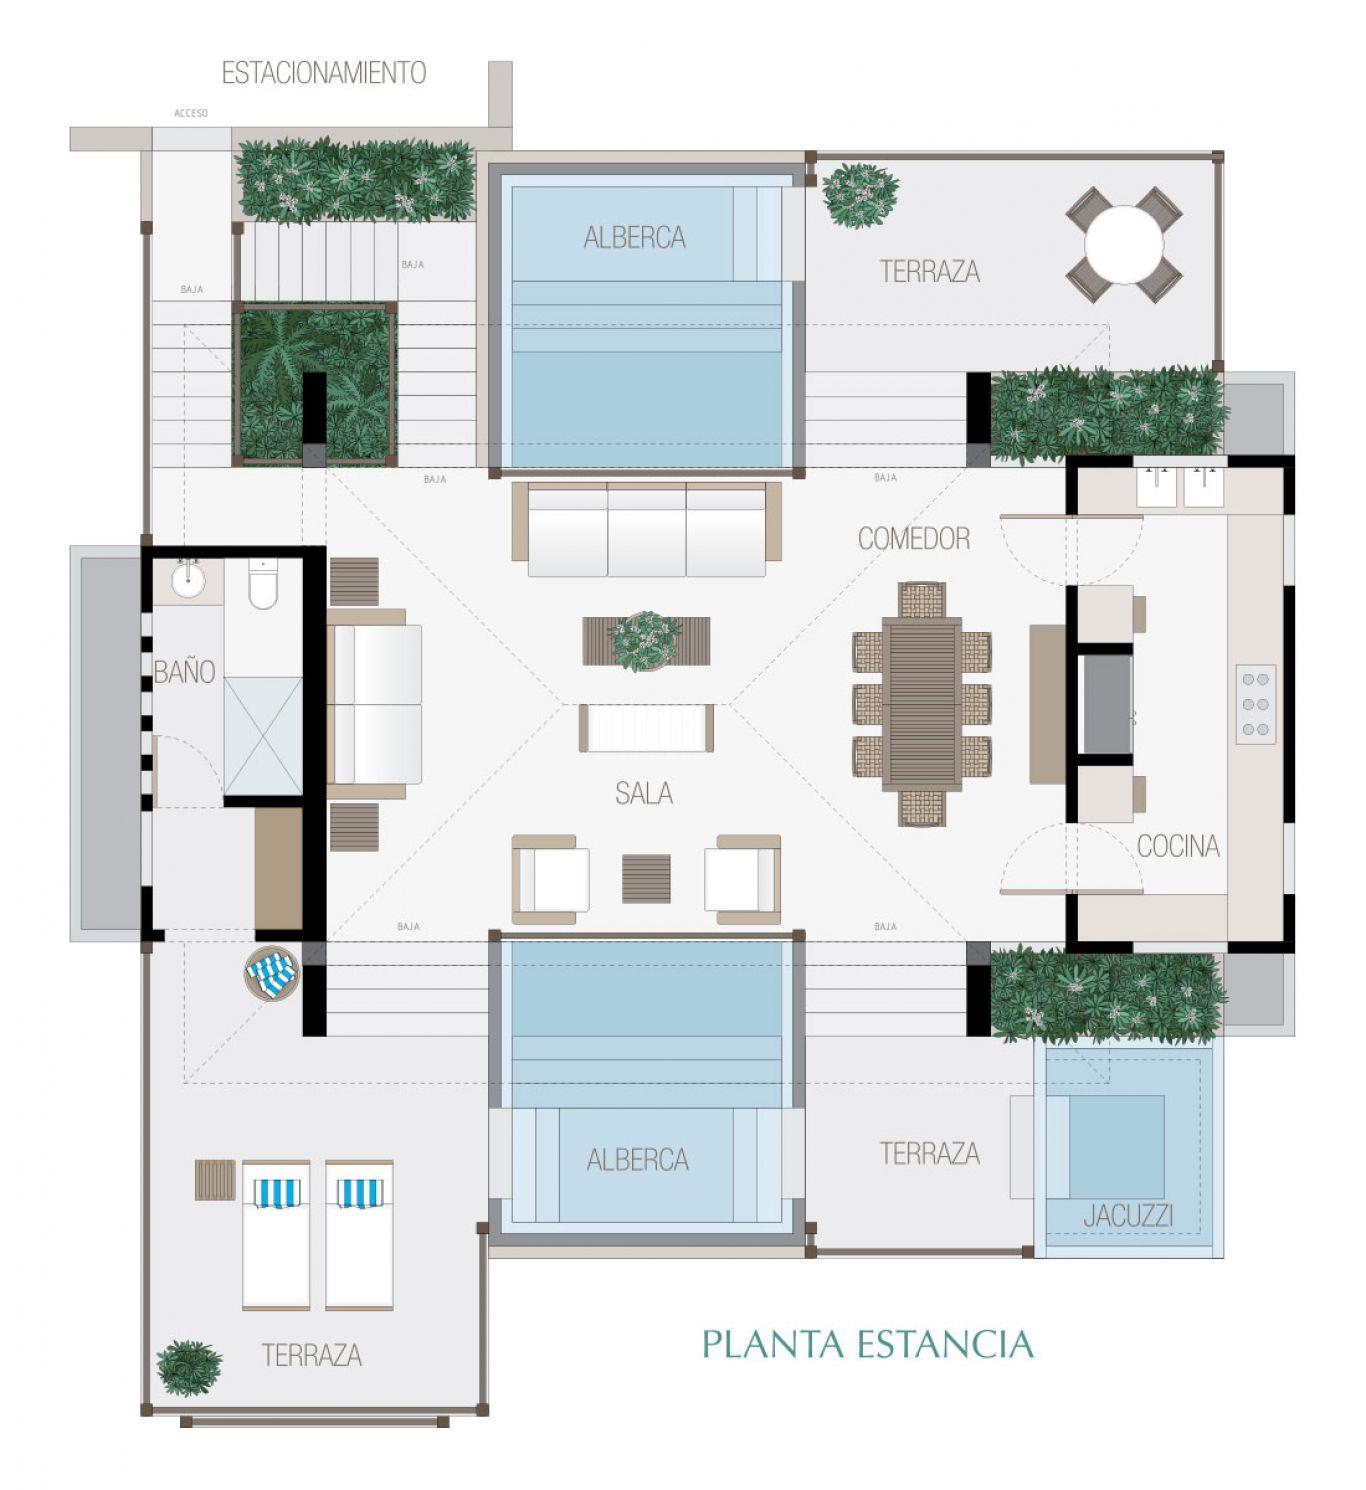 Manai, id 1519068, no 2, plano de villa 10, 300